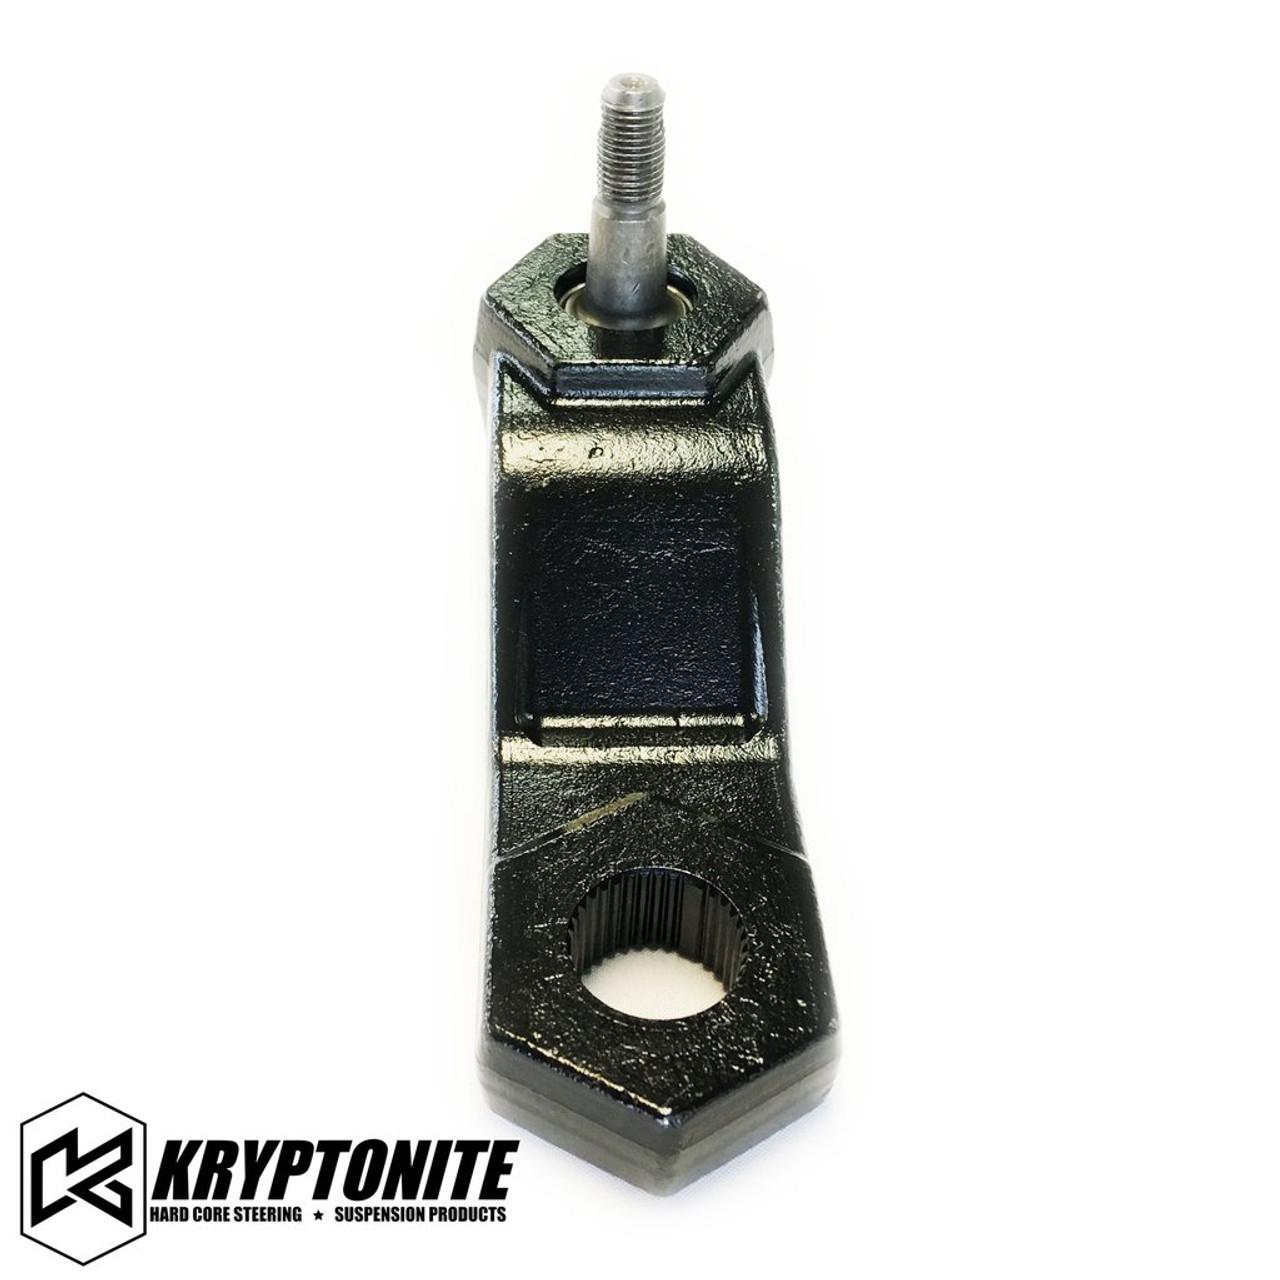 KRYPTONITE KR6536 DEATH GRIP PITMAN ARM FOR PSC STEERING BOX